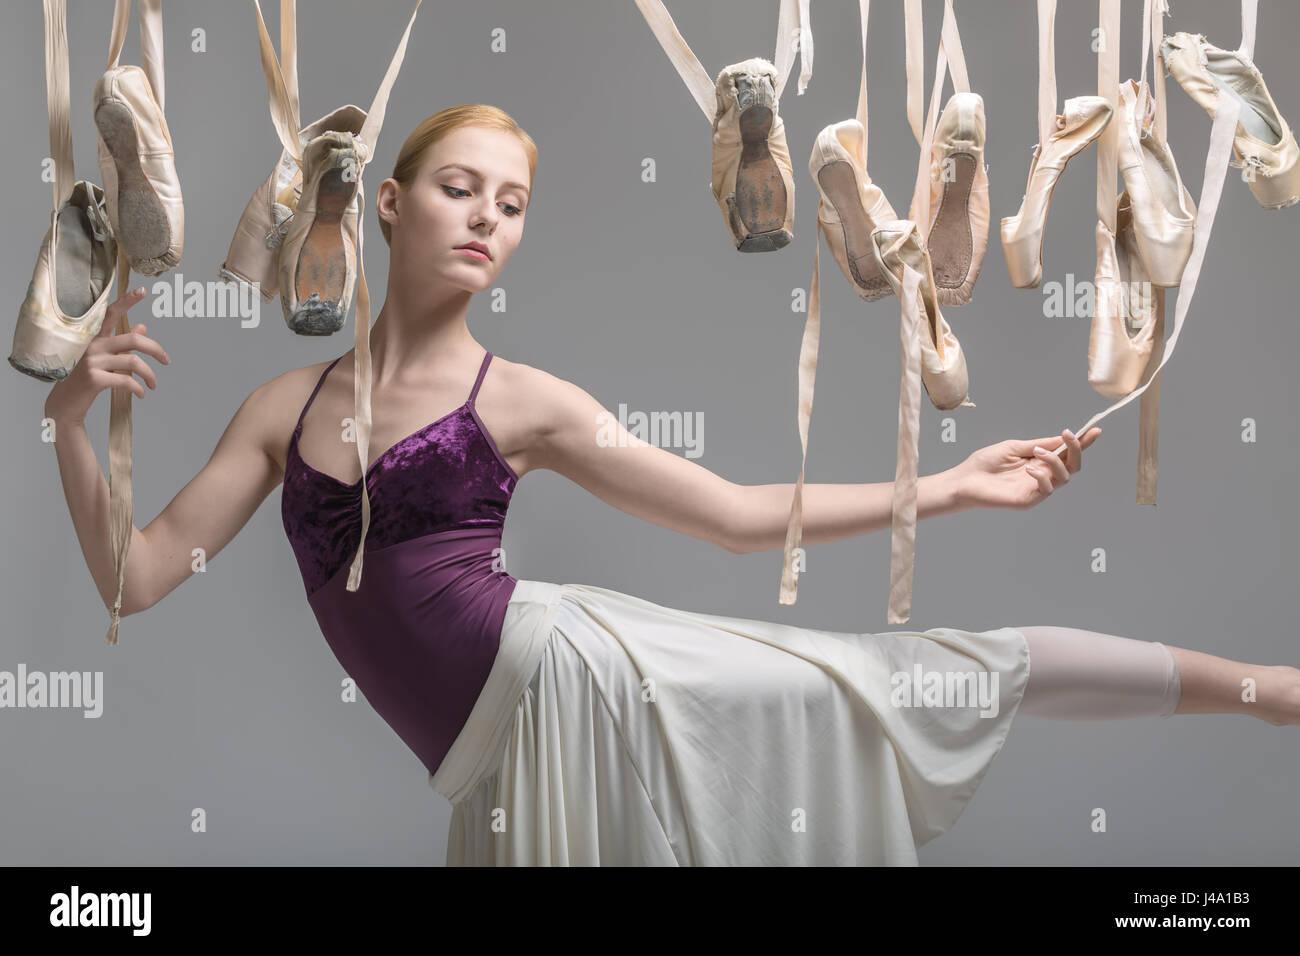 Ballerine blonde et pointes Photo Stock